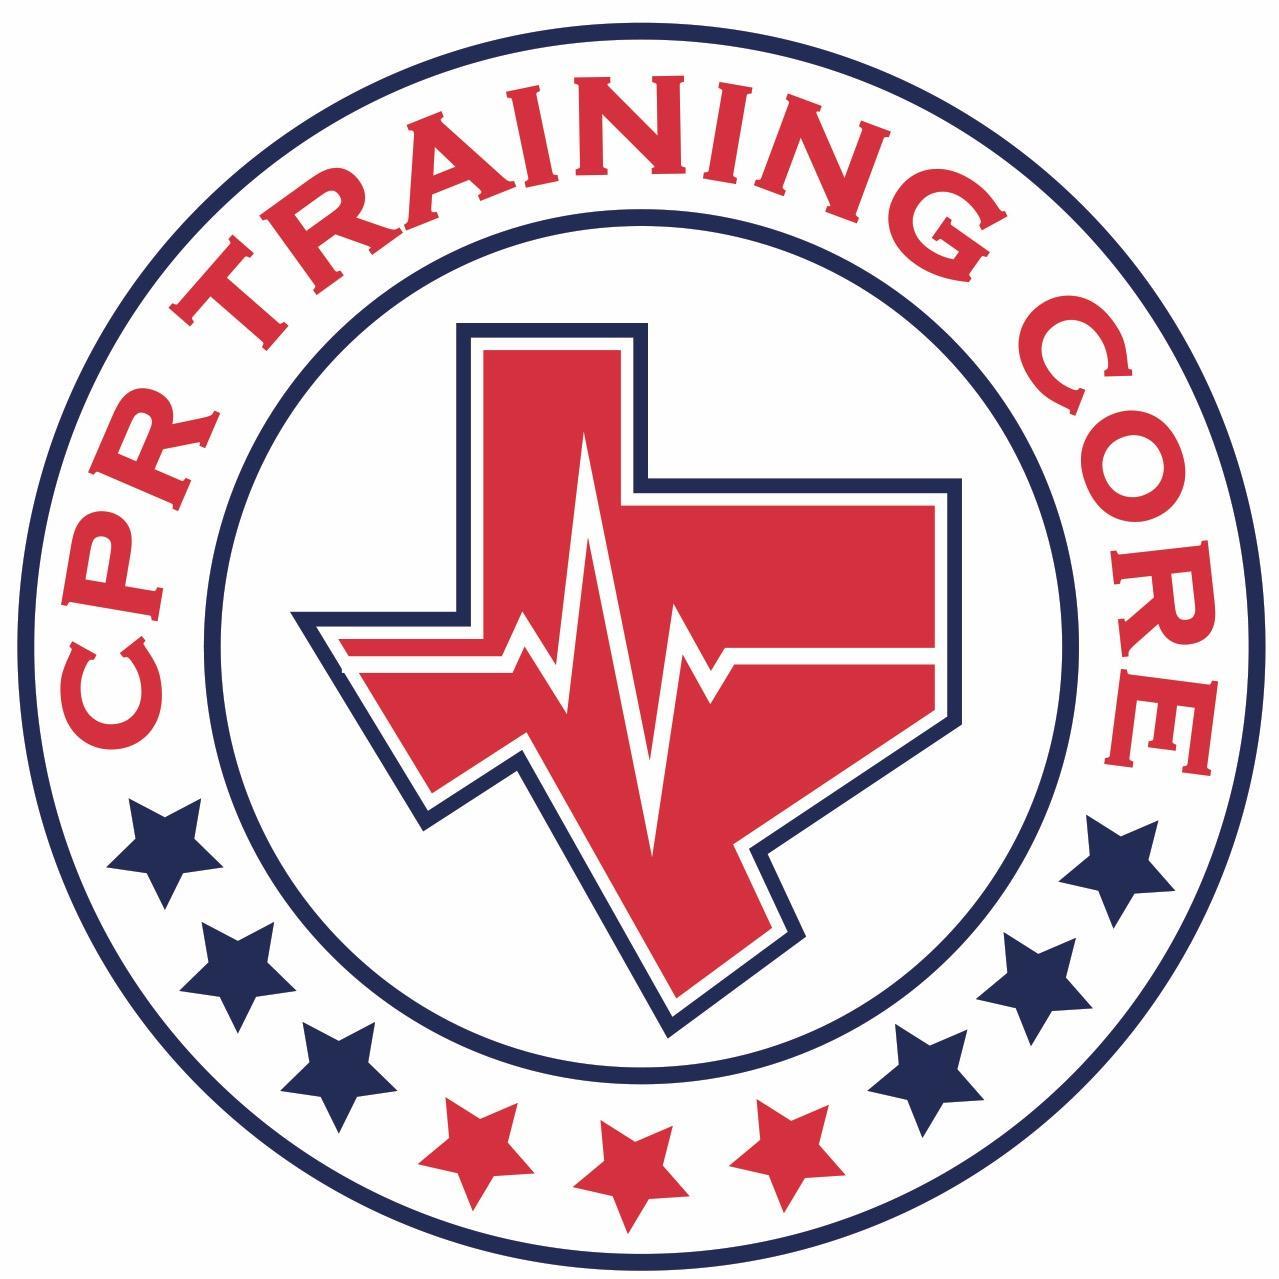 CPR Training Core, LLC. 6141 Hollyhock Rd. San Antonio, TX